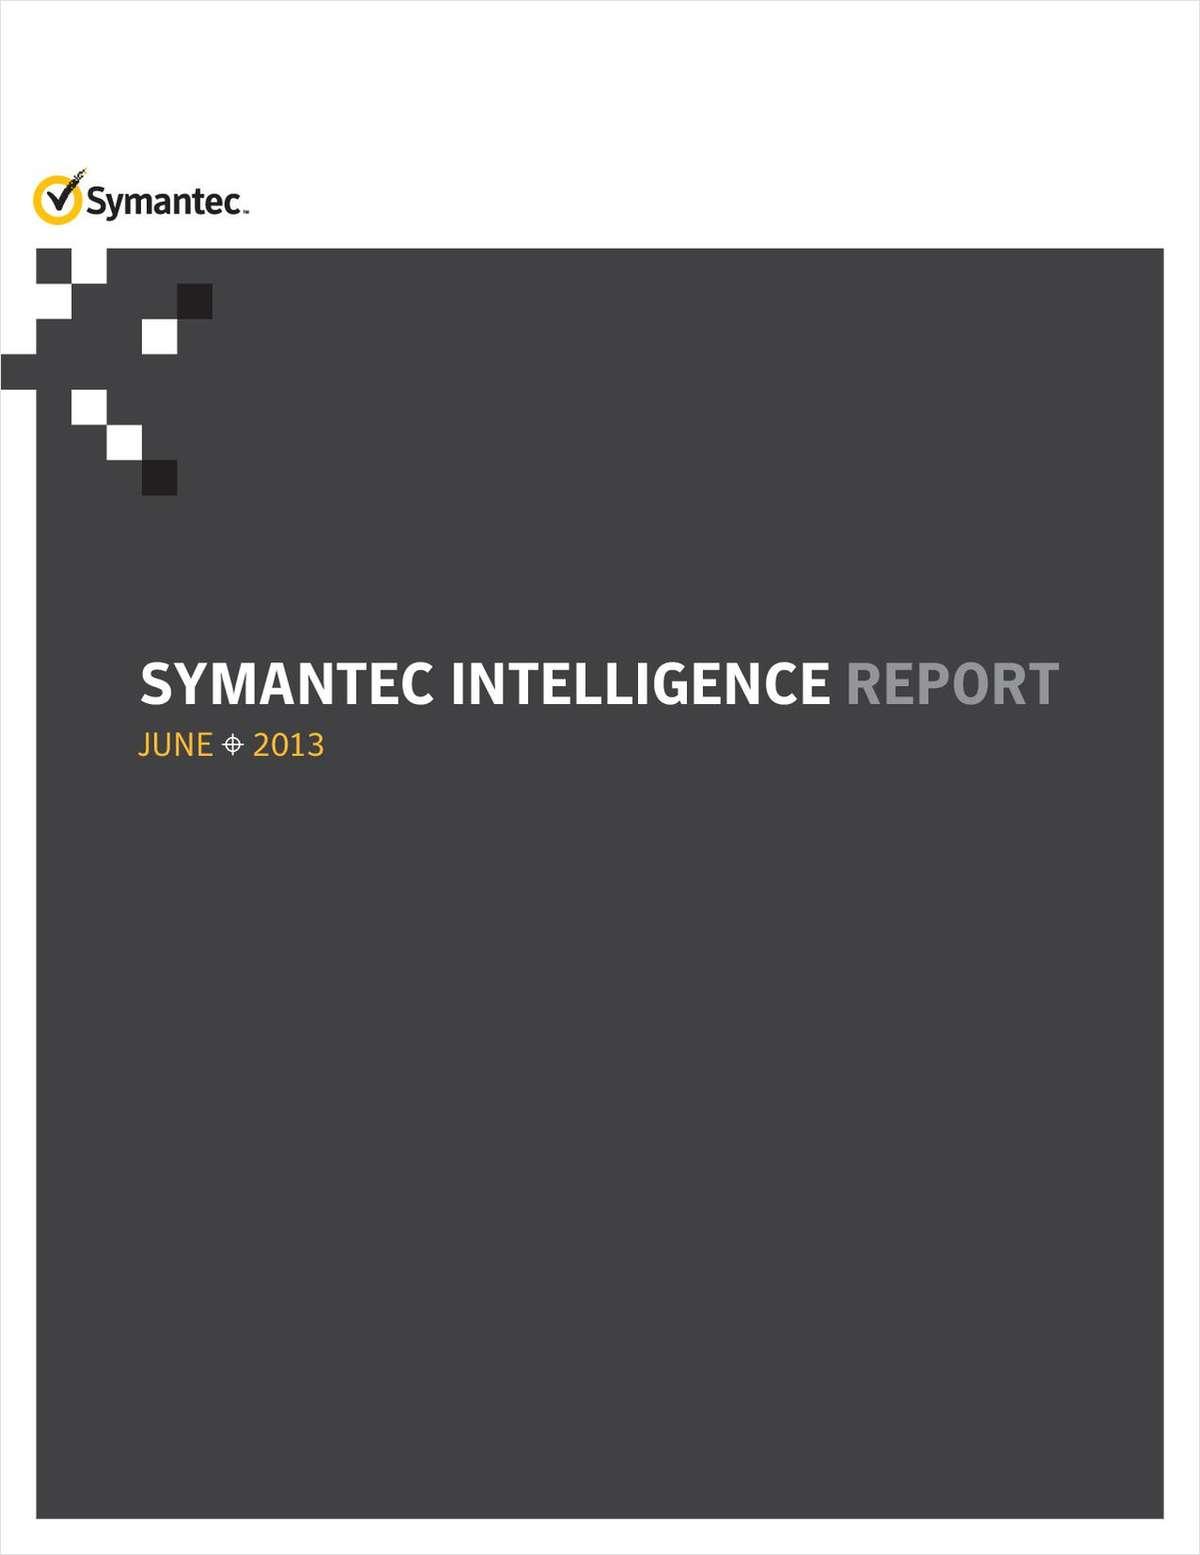 Symantec Intelligence Report: June 2013